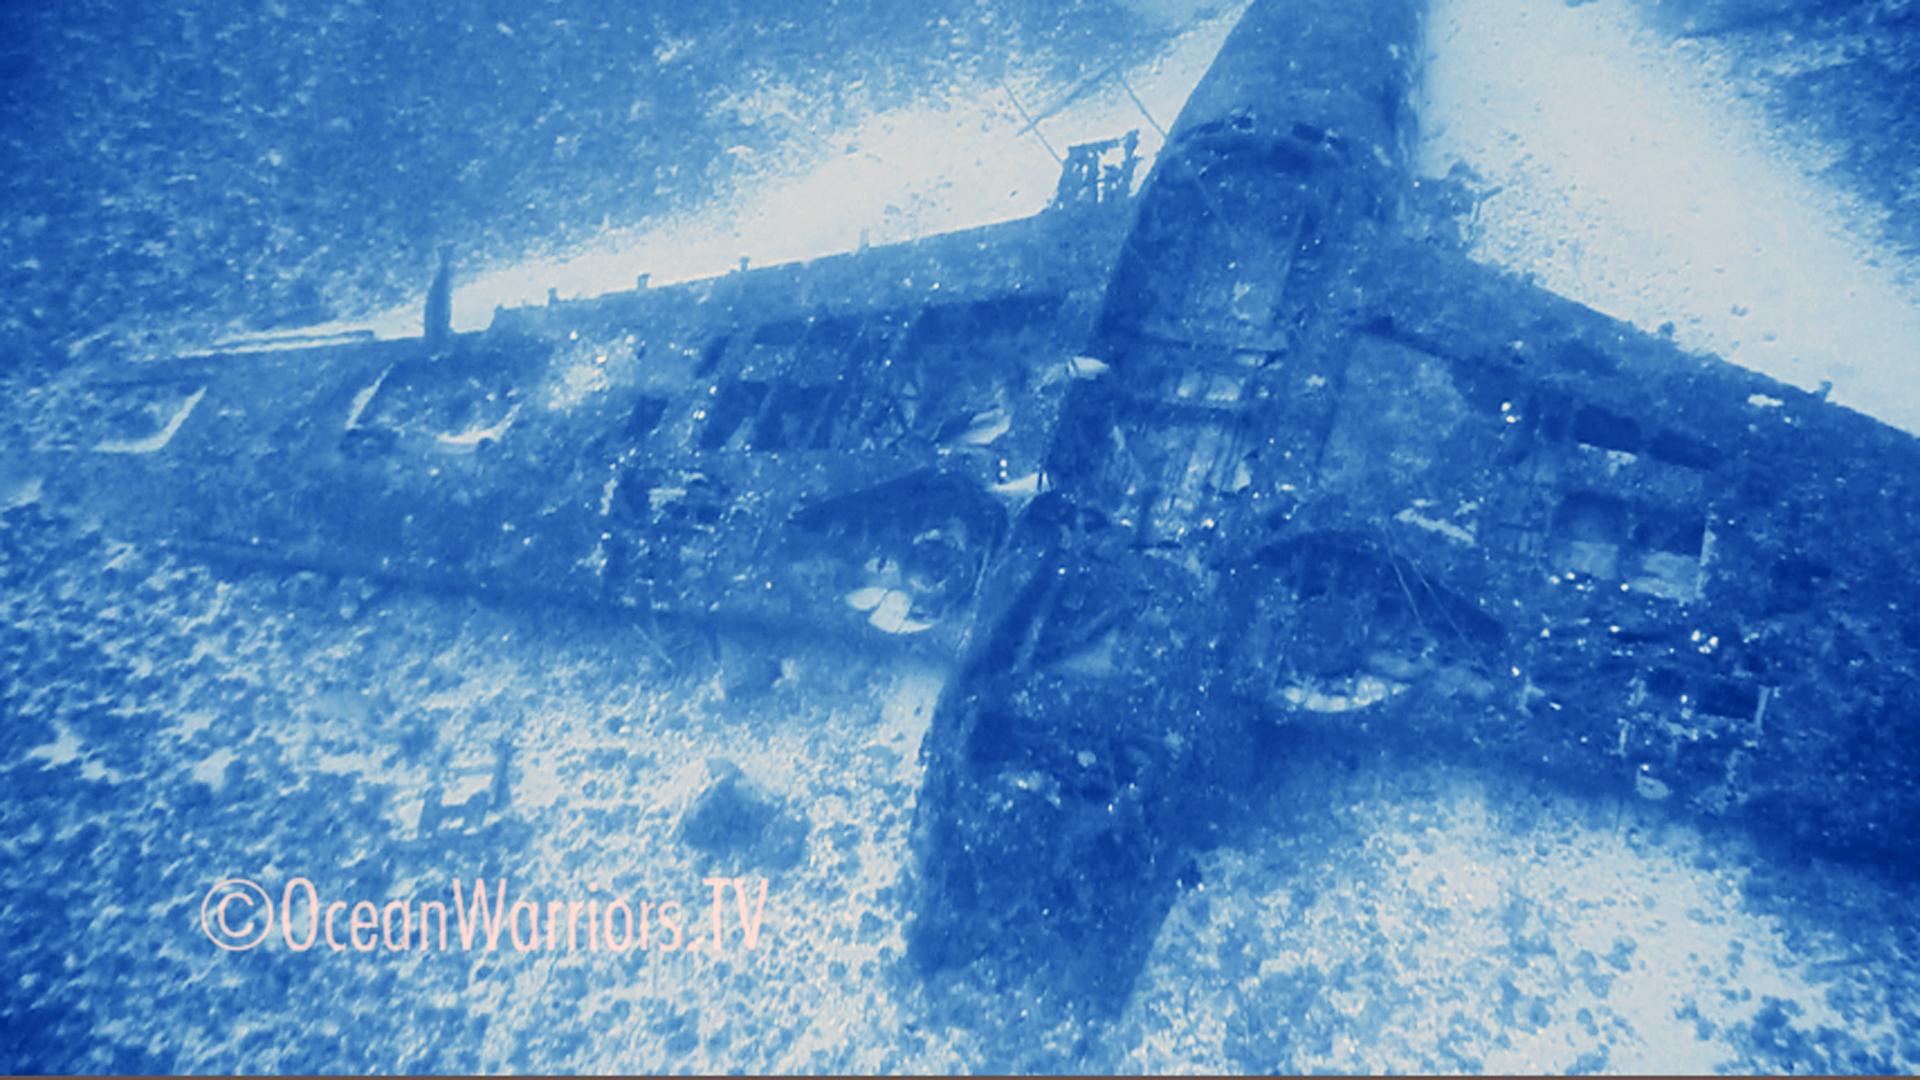 Helldiver Fuselage Upside Down On Ocean Floor Ocean Warriors